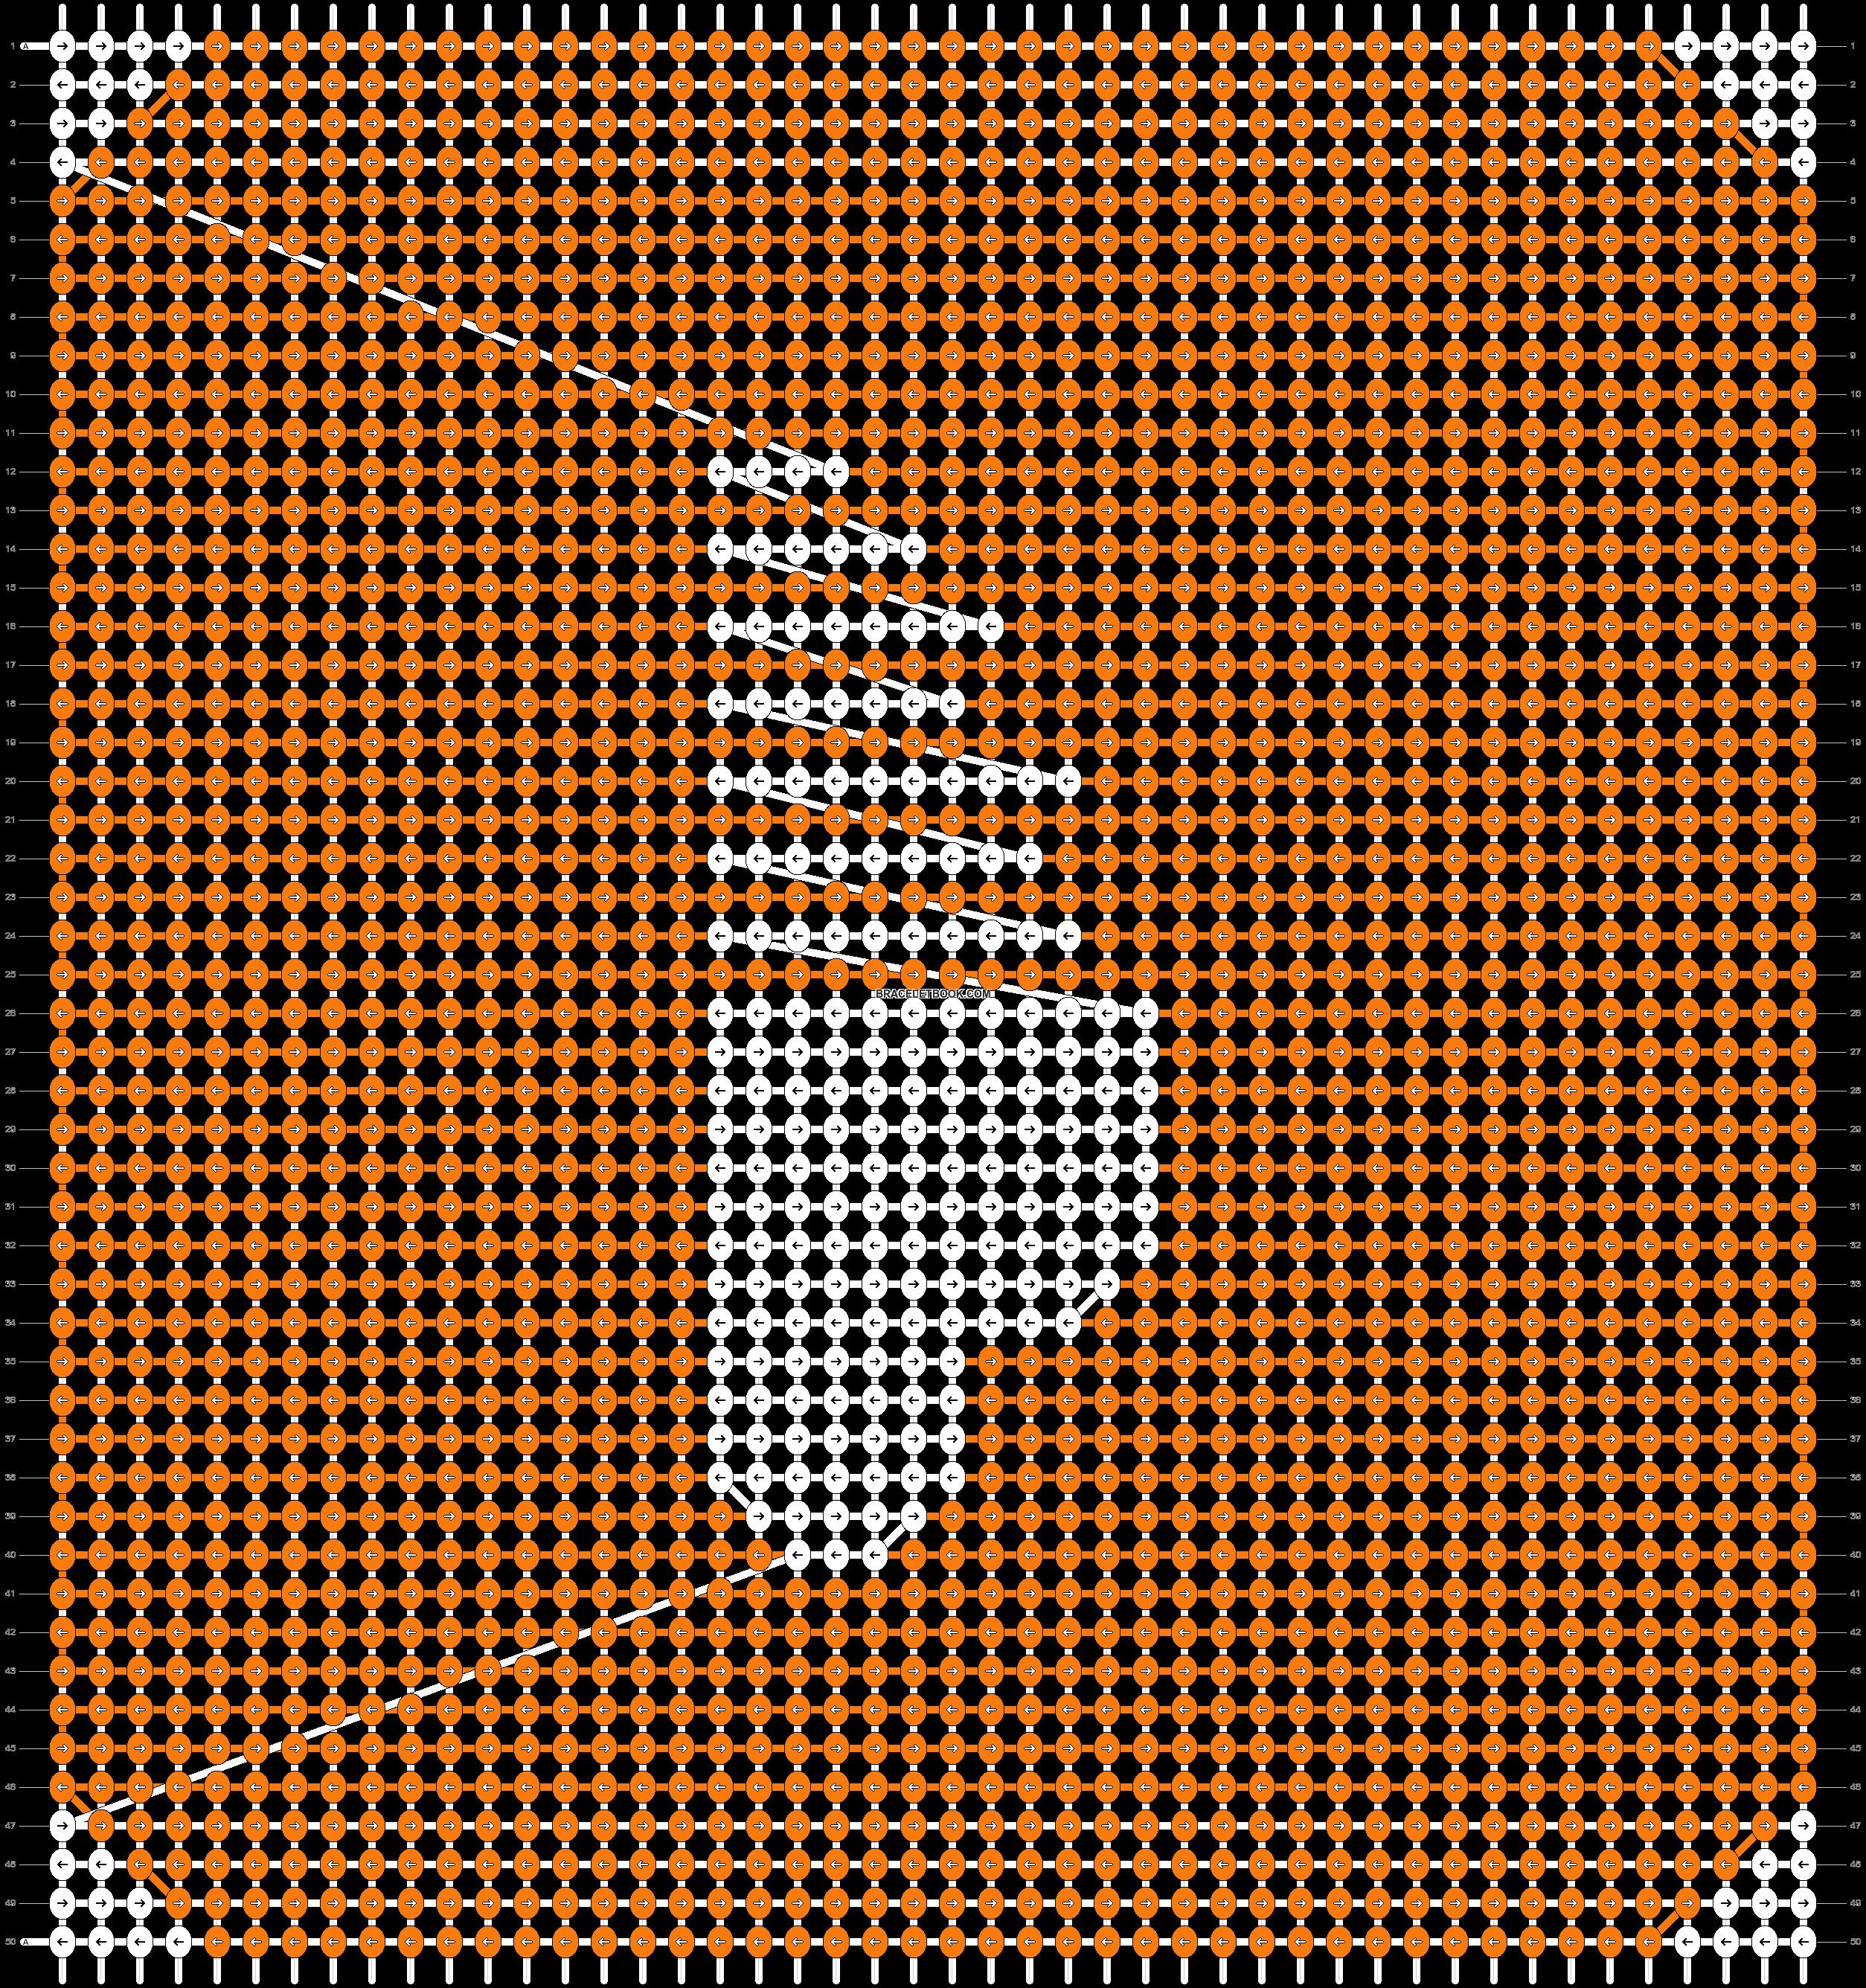 Alpha pattern #18383 pattern